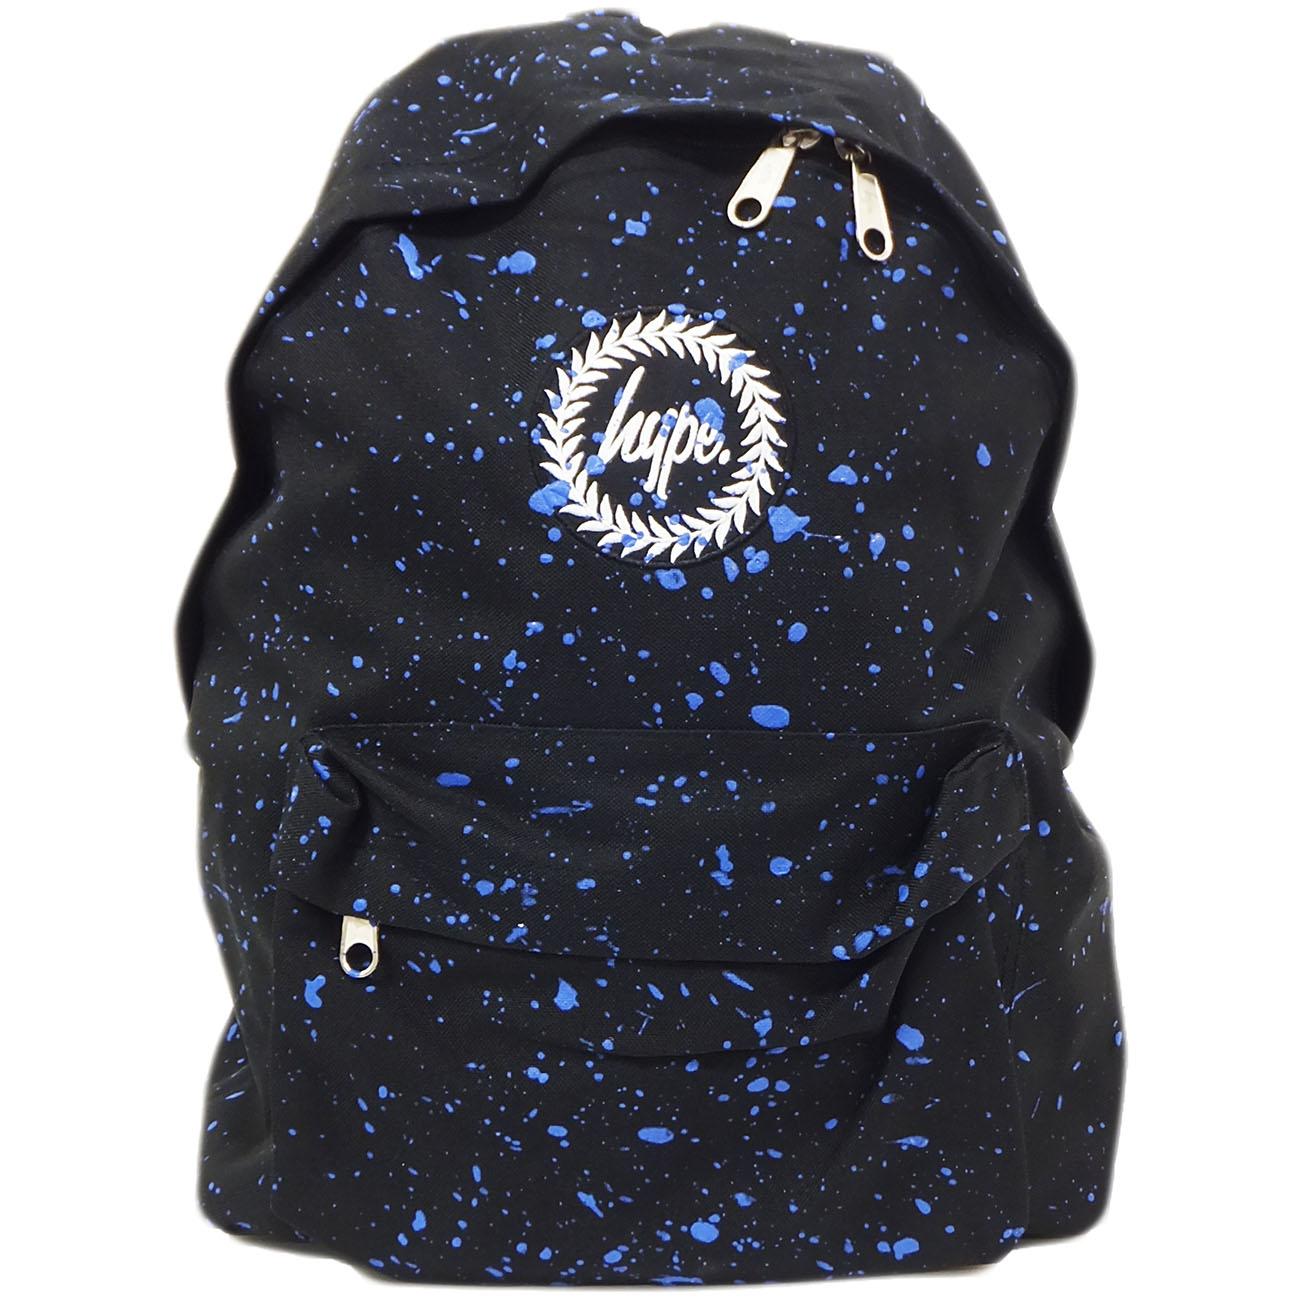 Hype Black and Blue Splatter Backpack